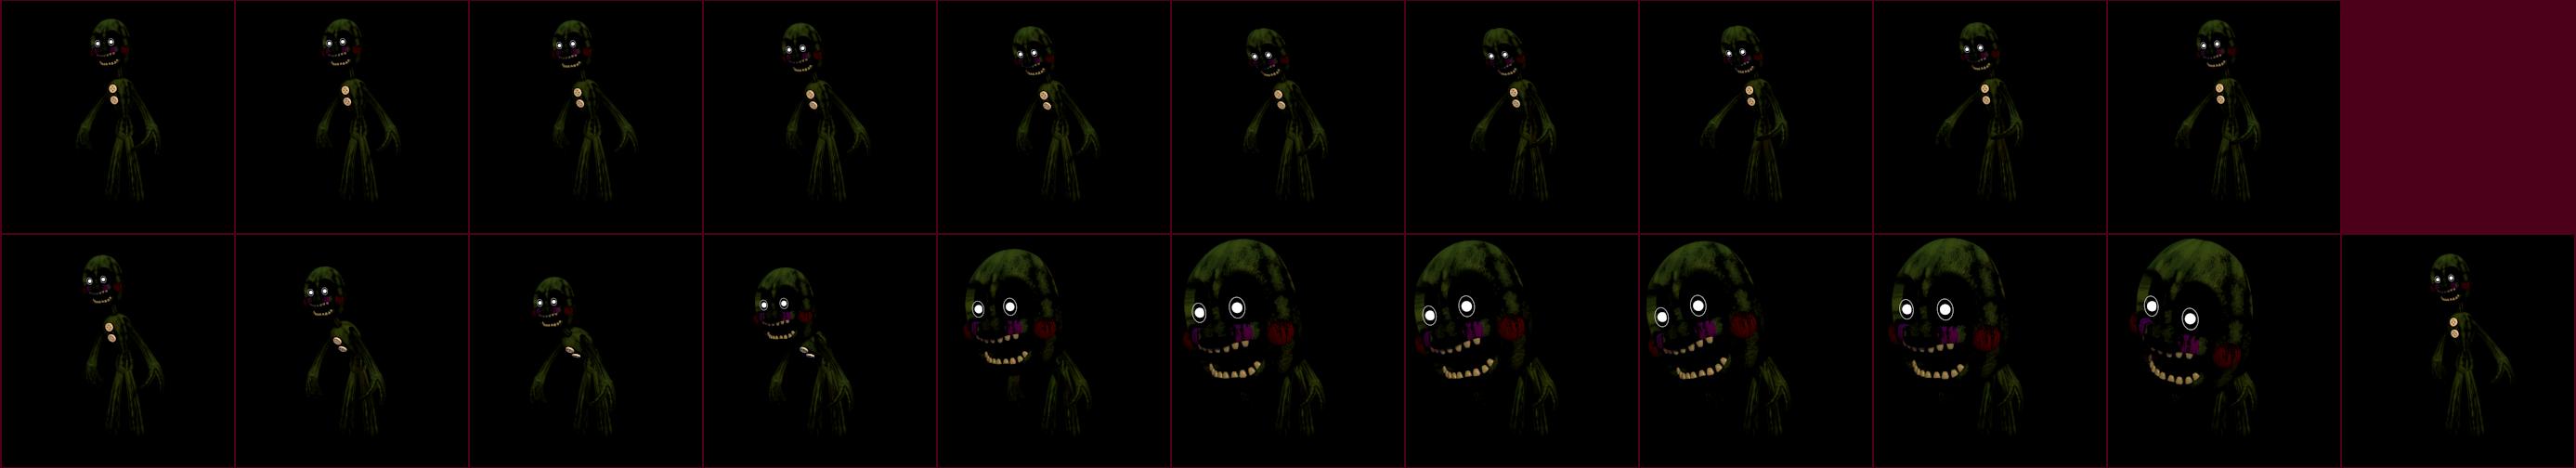 Pc computer fnaf world phantom marionette the spriters